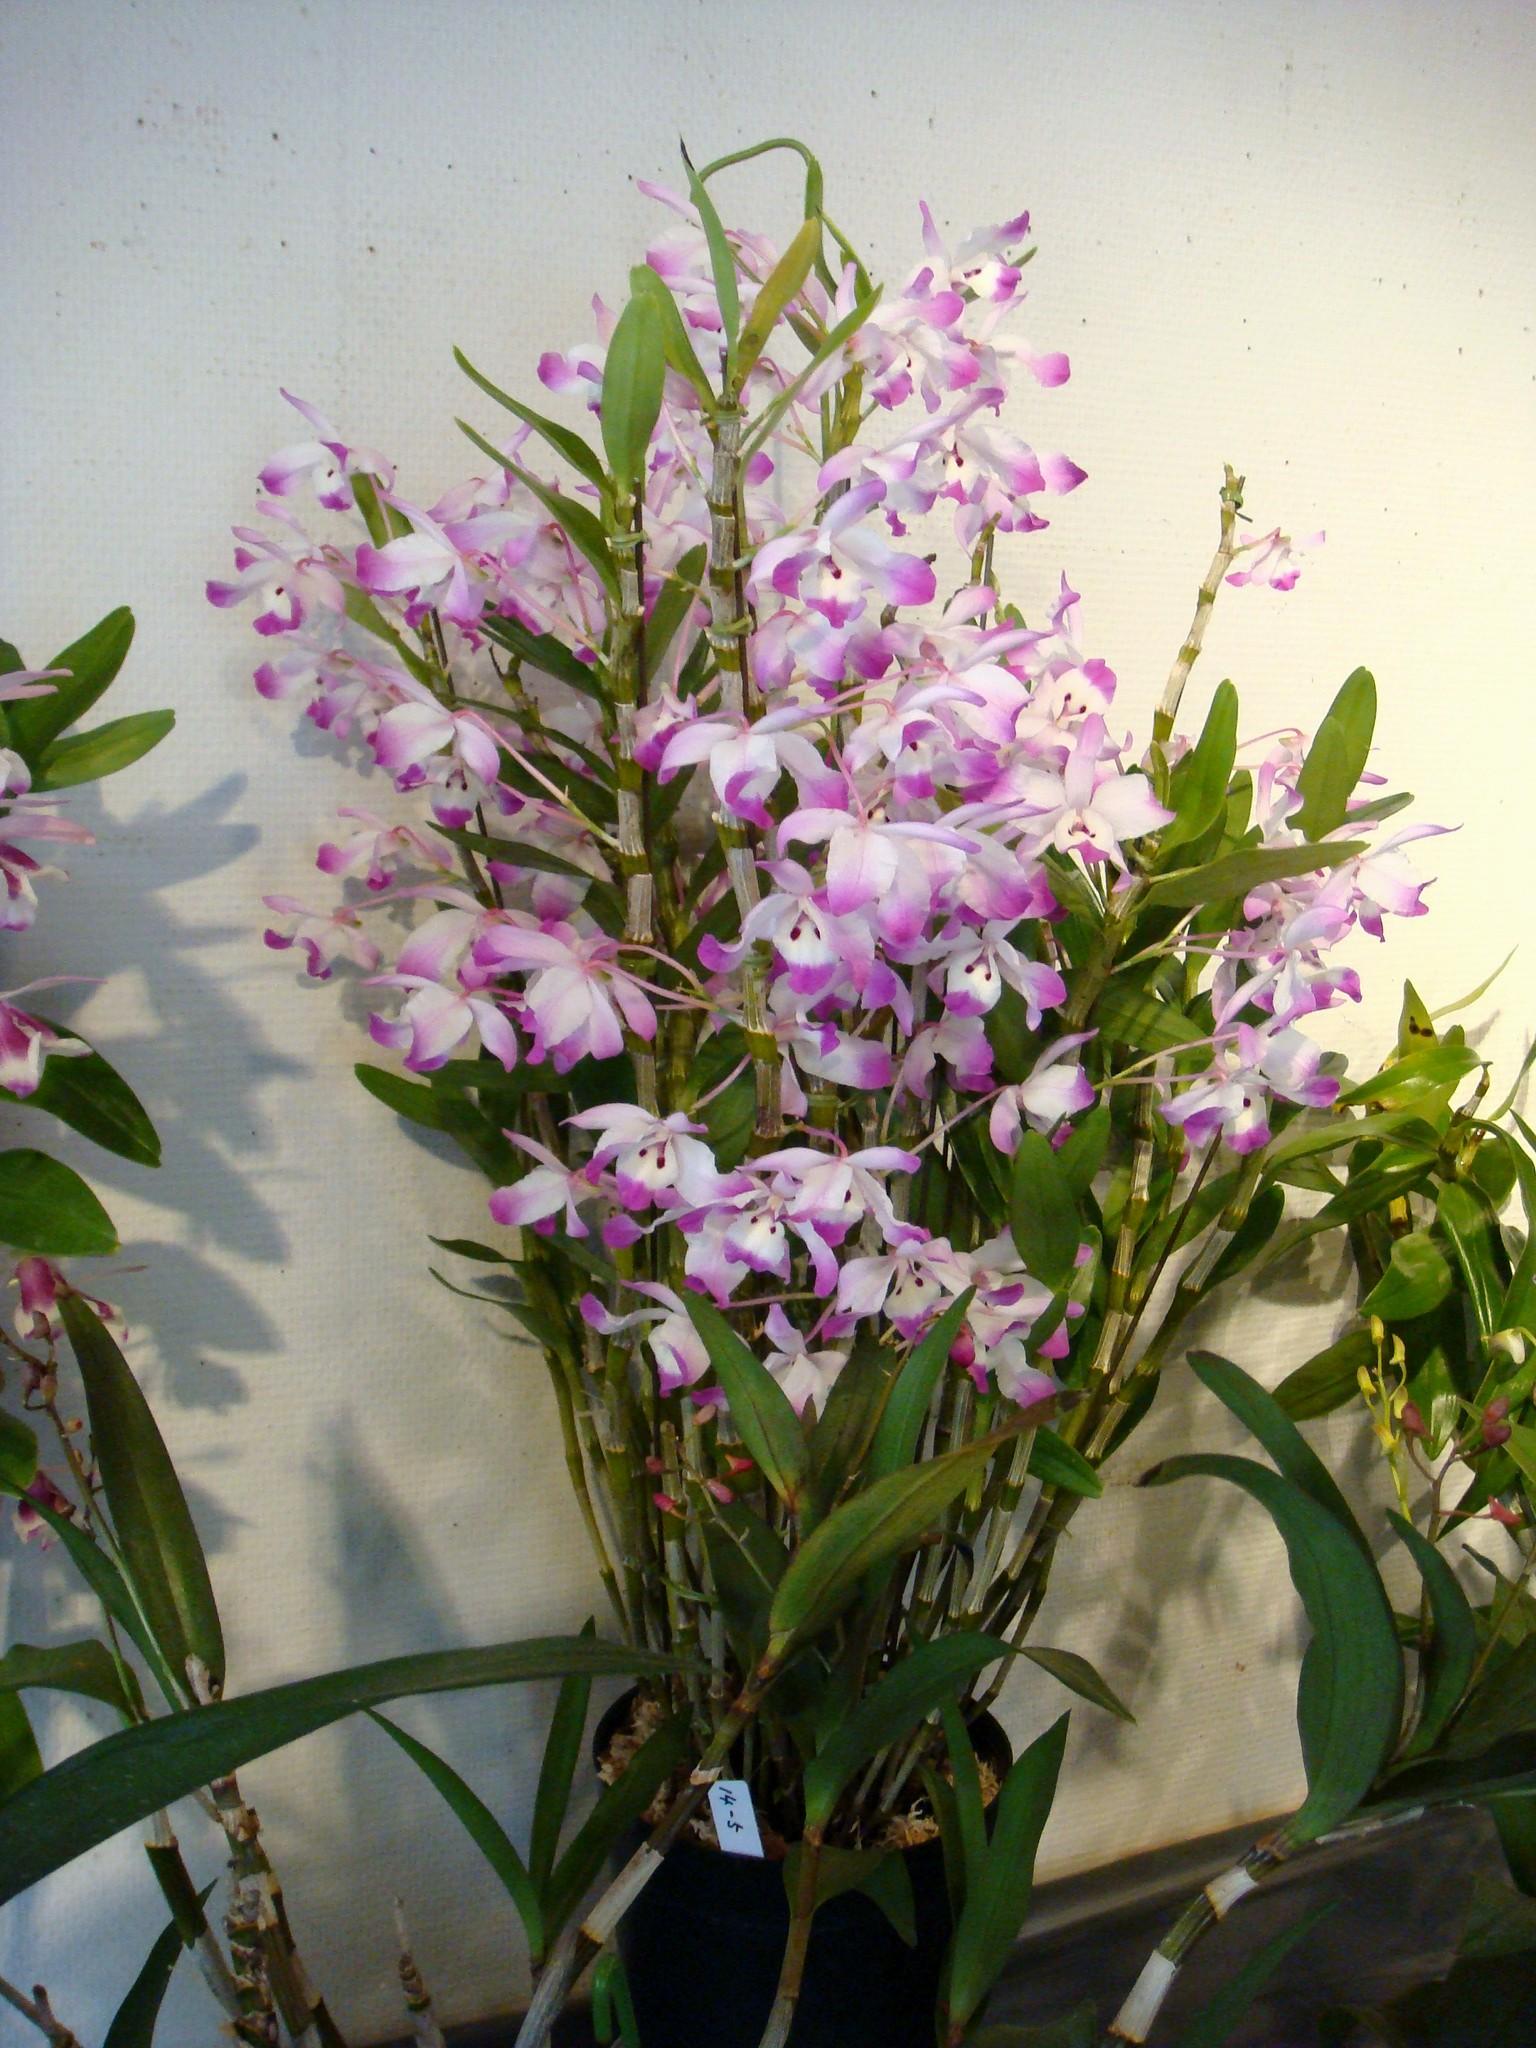 http://orchids.la.coocan.jp/Dendrobium/Dendrobium%20chlorostylum/DSC03492.JPG